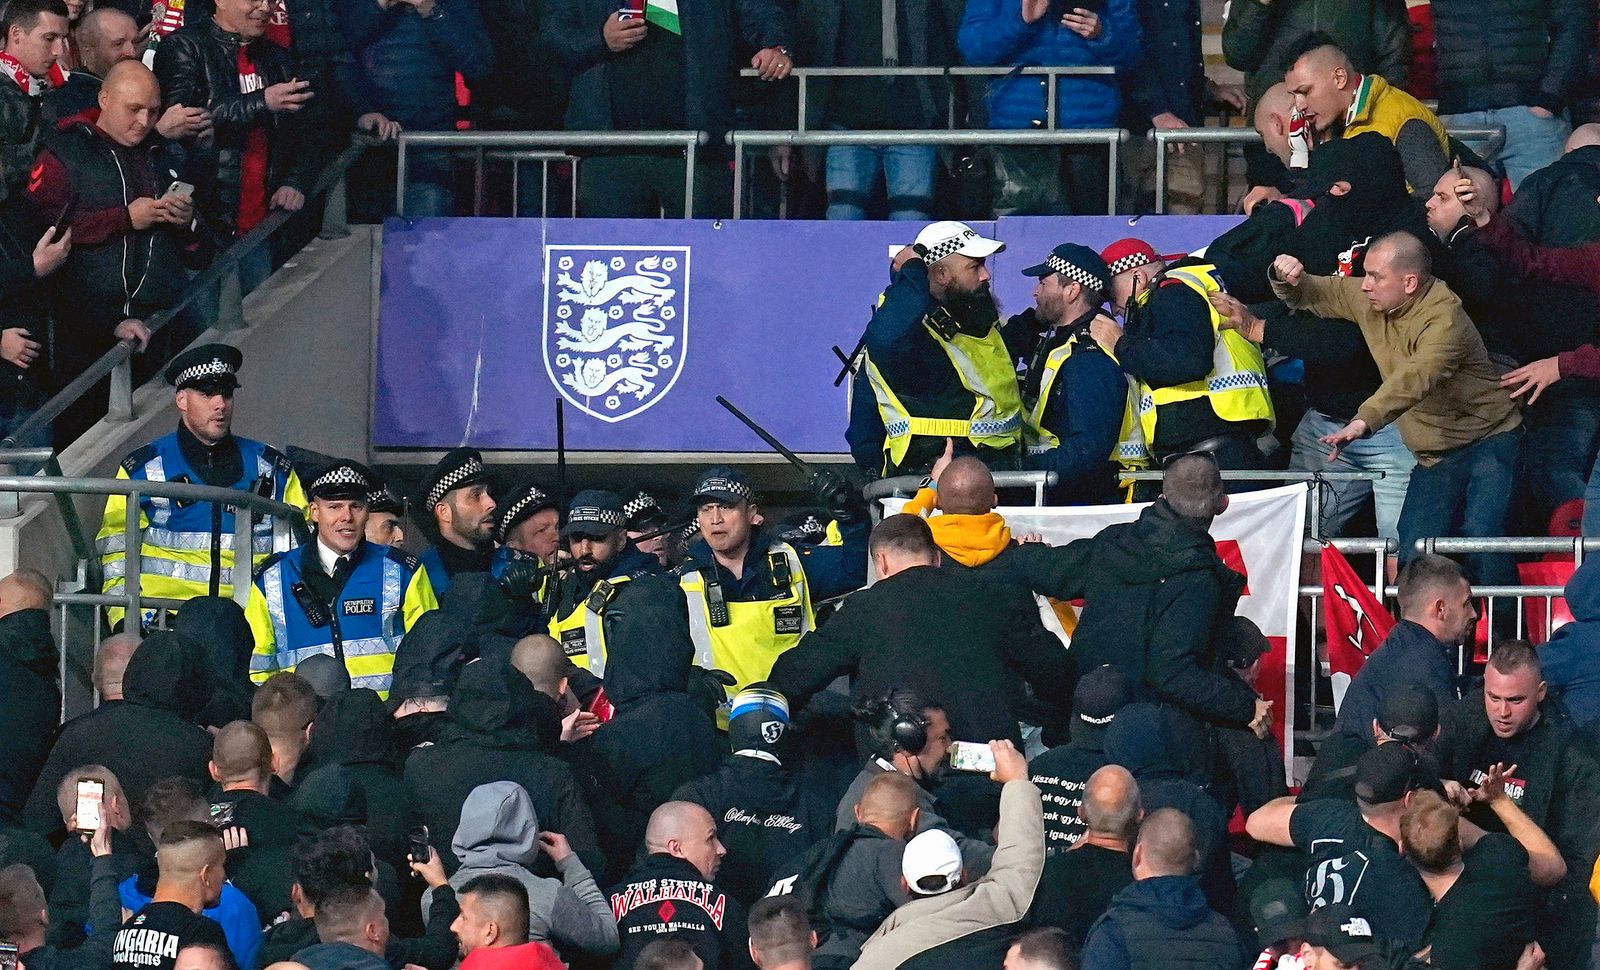 APTOPIX Britain Soccer Hungary Fans Wembley